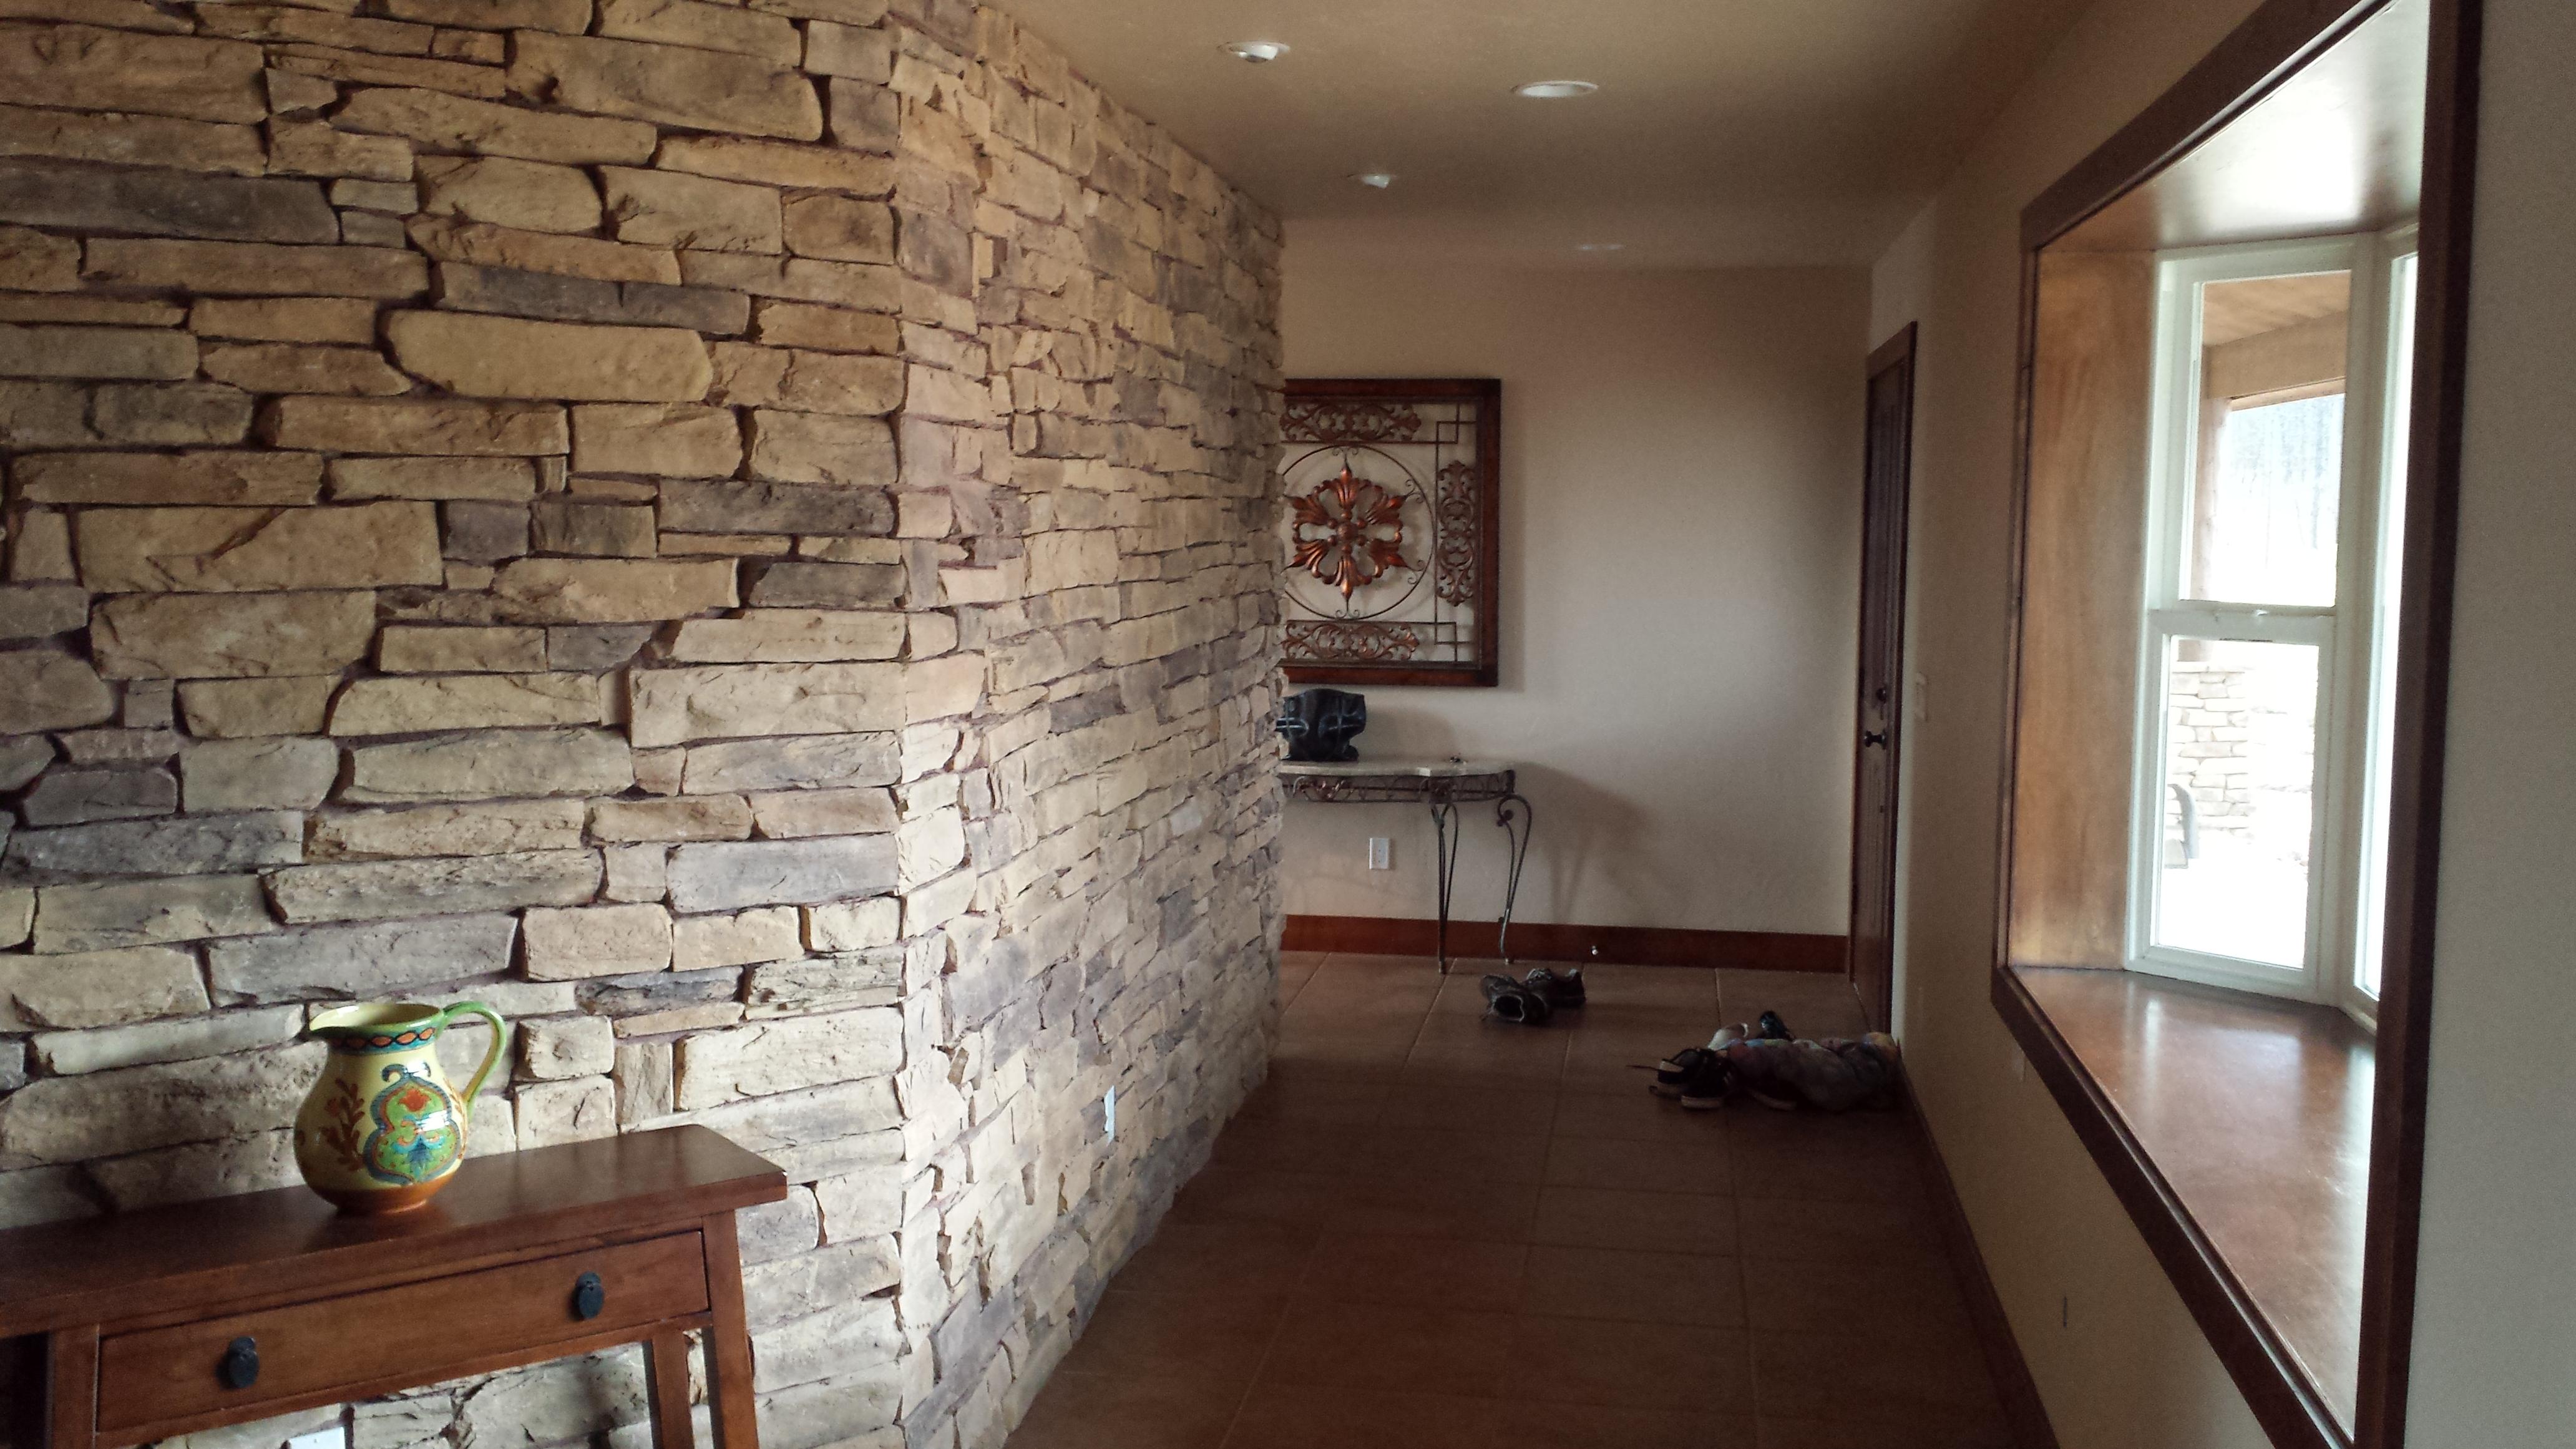 custom interior quality stucco stonequality stucco stone. Black Bedroom Furniture Sets. Home Design Ideas